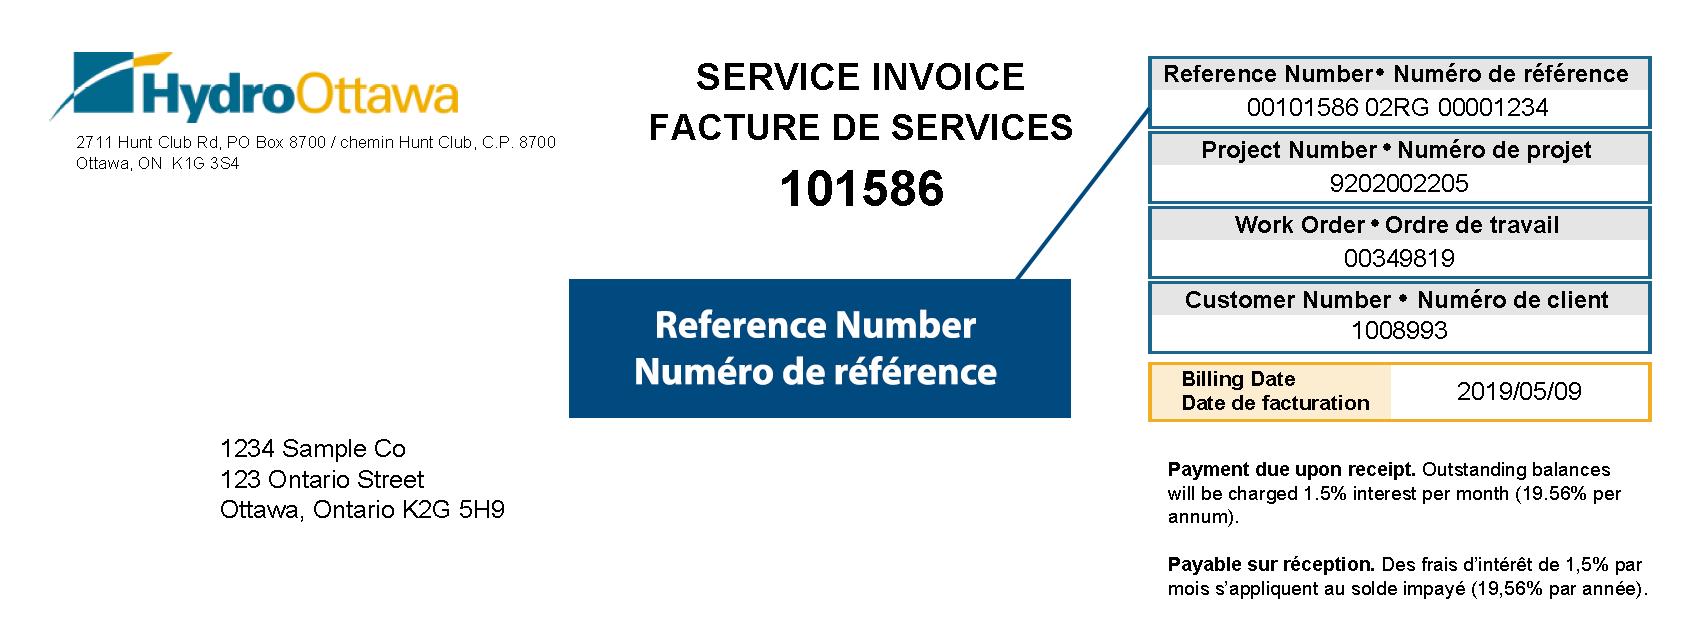 Hydro Ottawa Reference Number